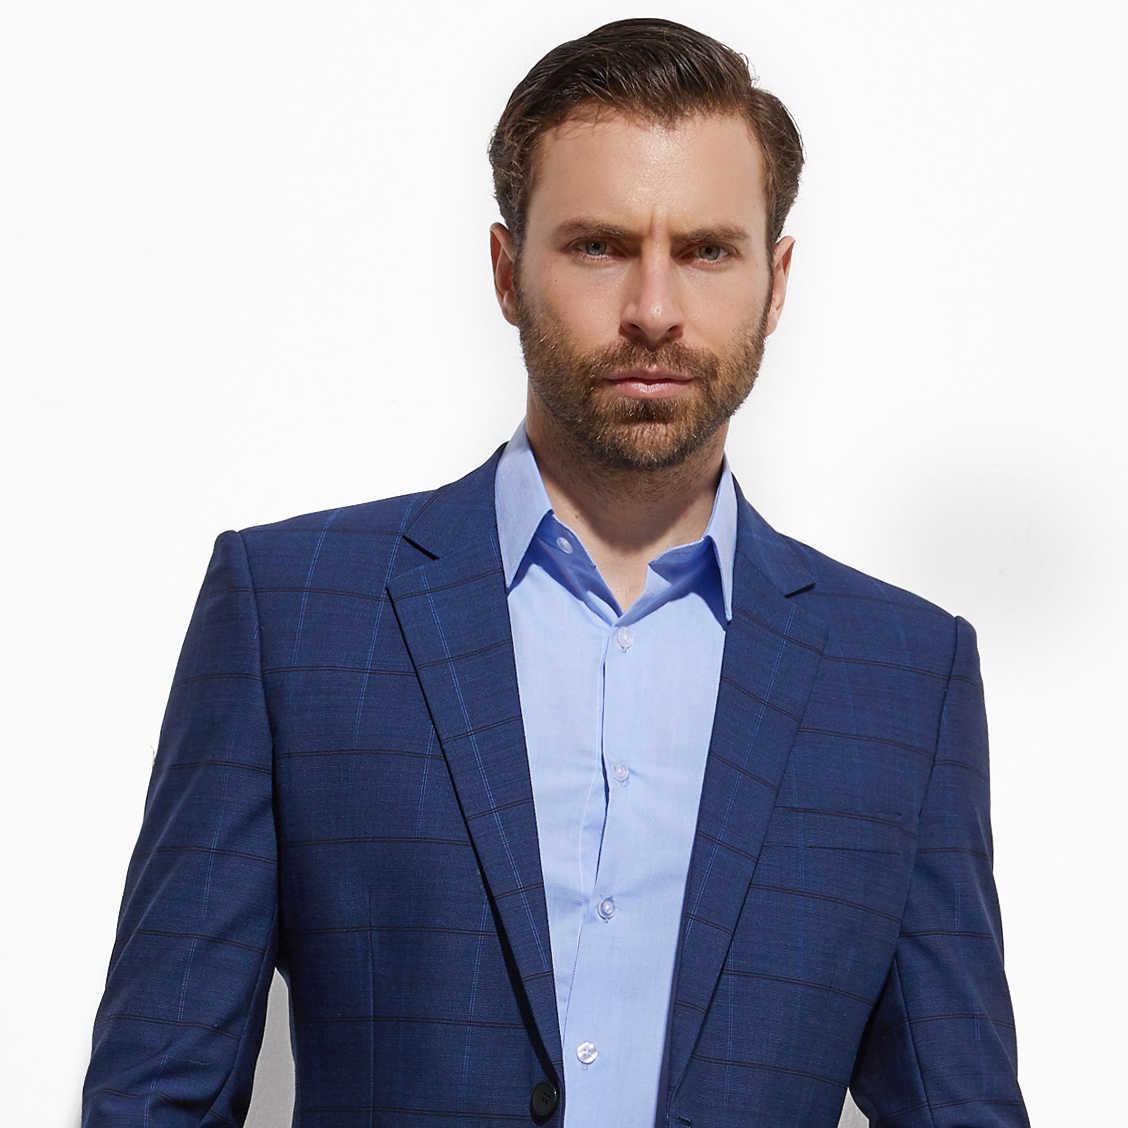 2020 Fashion Smart Casual Donkerblauw Plaid Pak Custom Made Slim Fit Donkerblauwe Ruit Pakken Met Nailhead Patroon